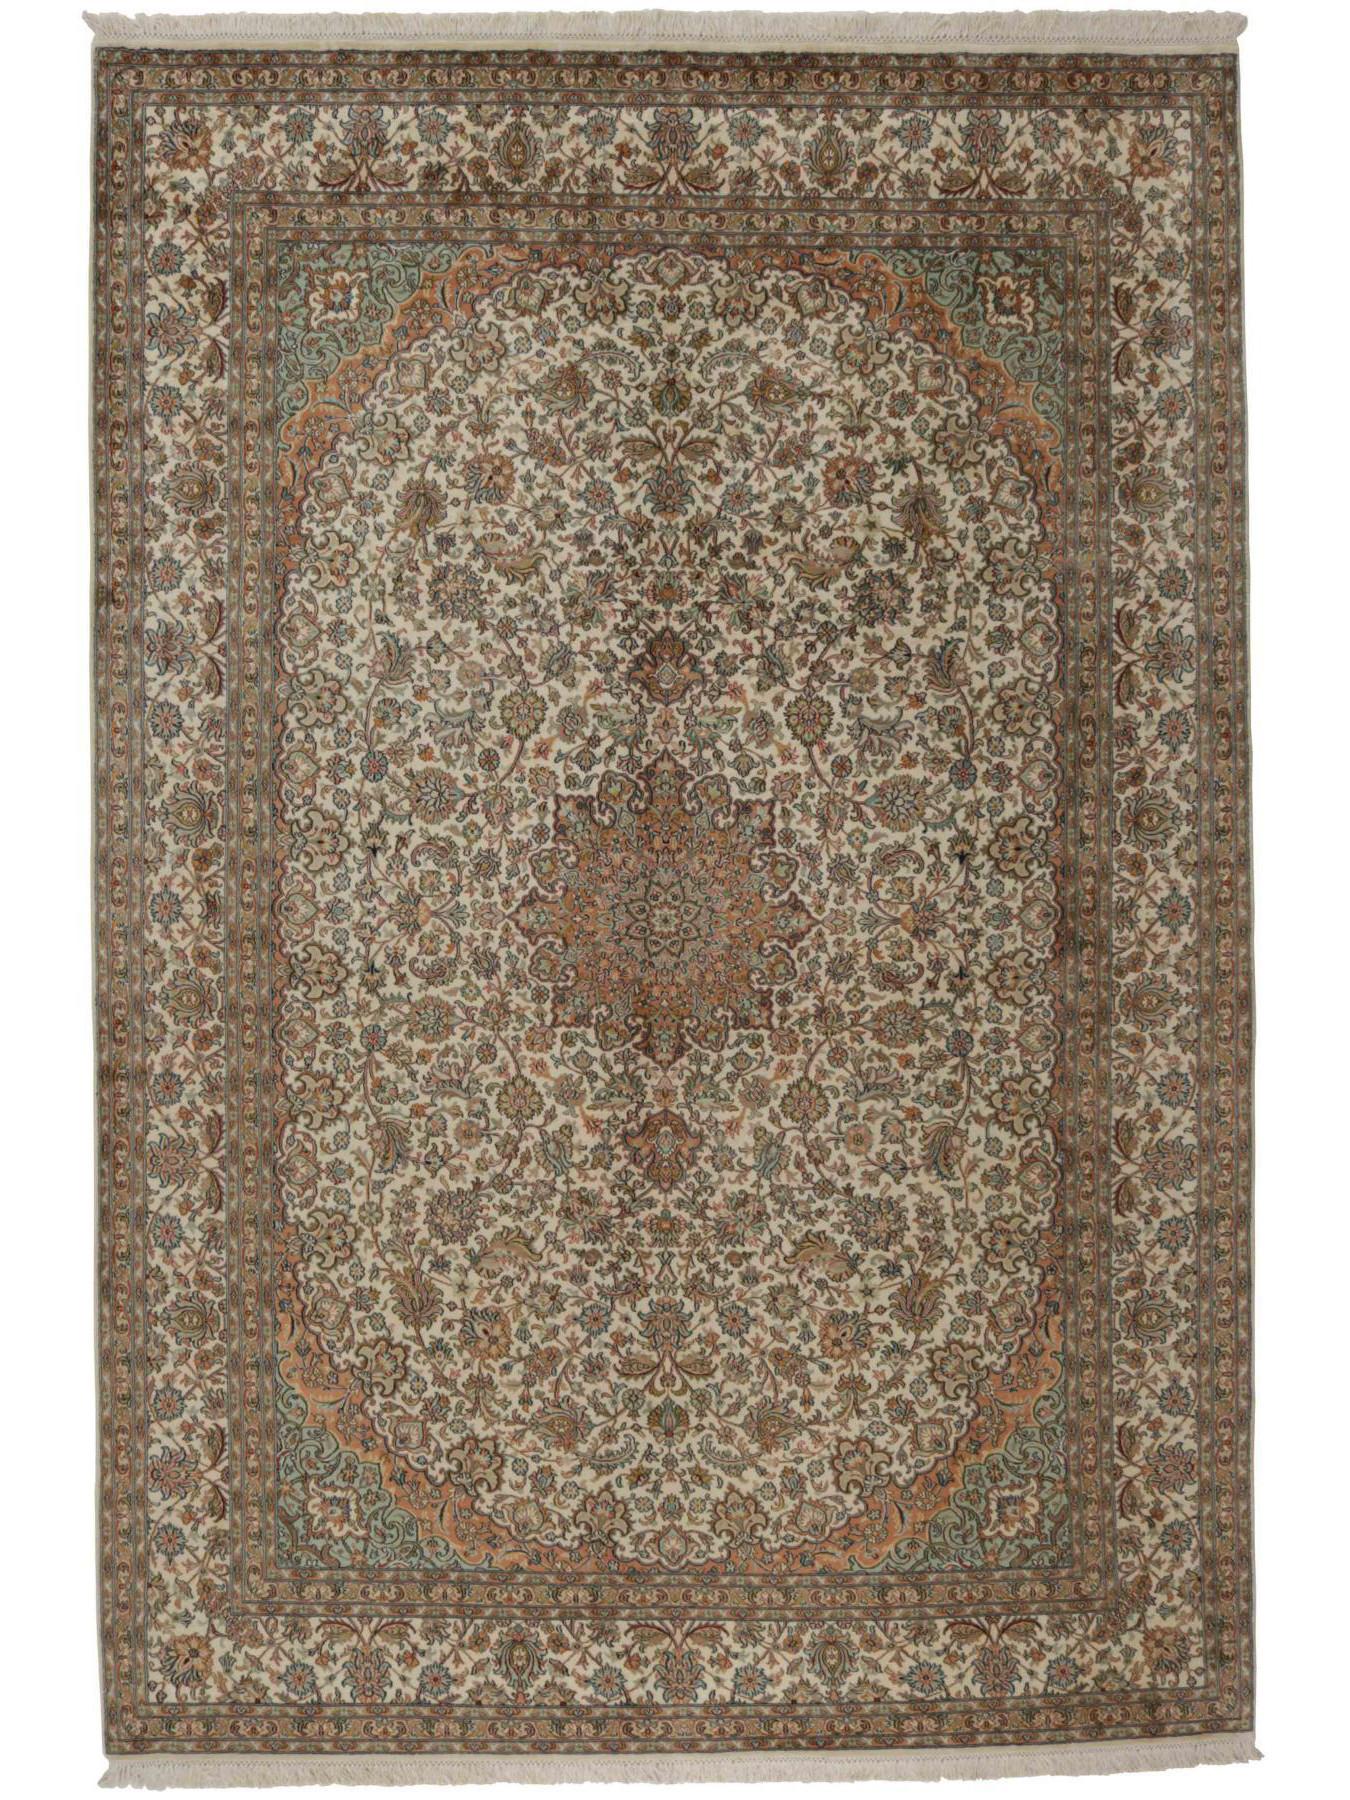 Prestigieuze tapijten - Srinagar Zijde